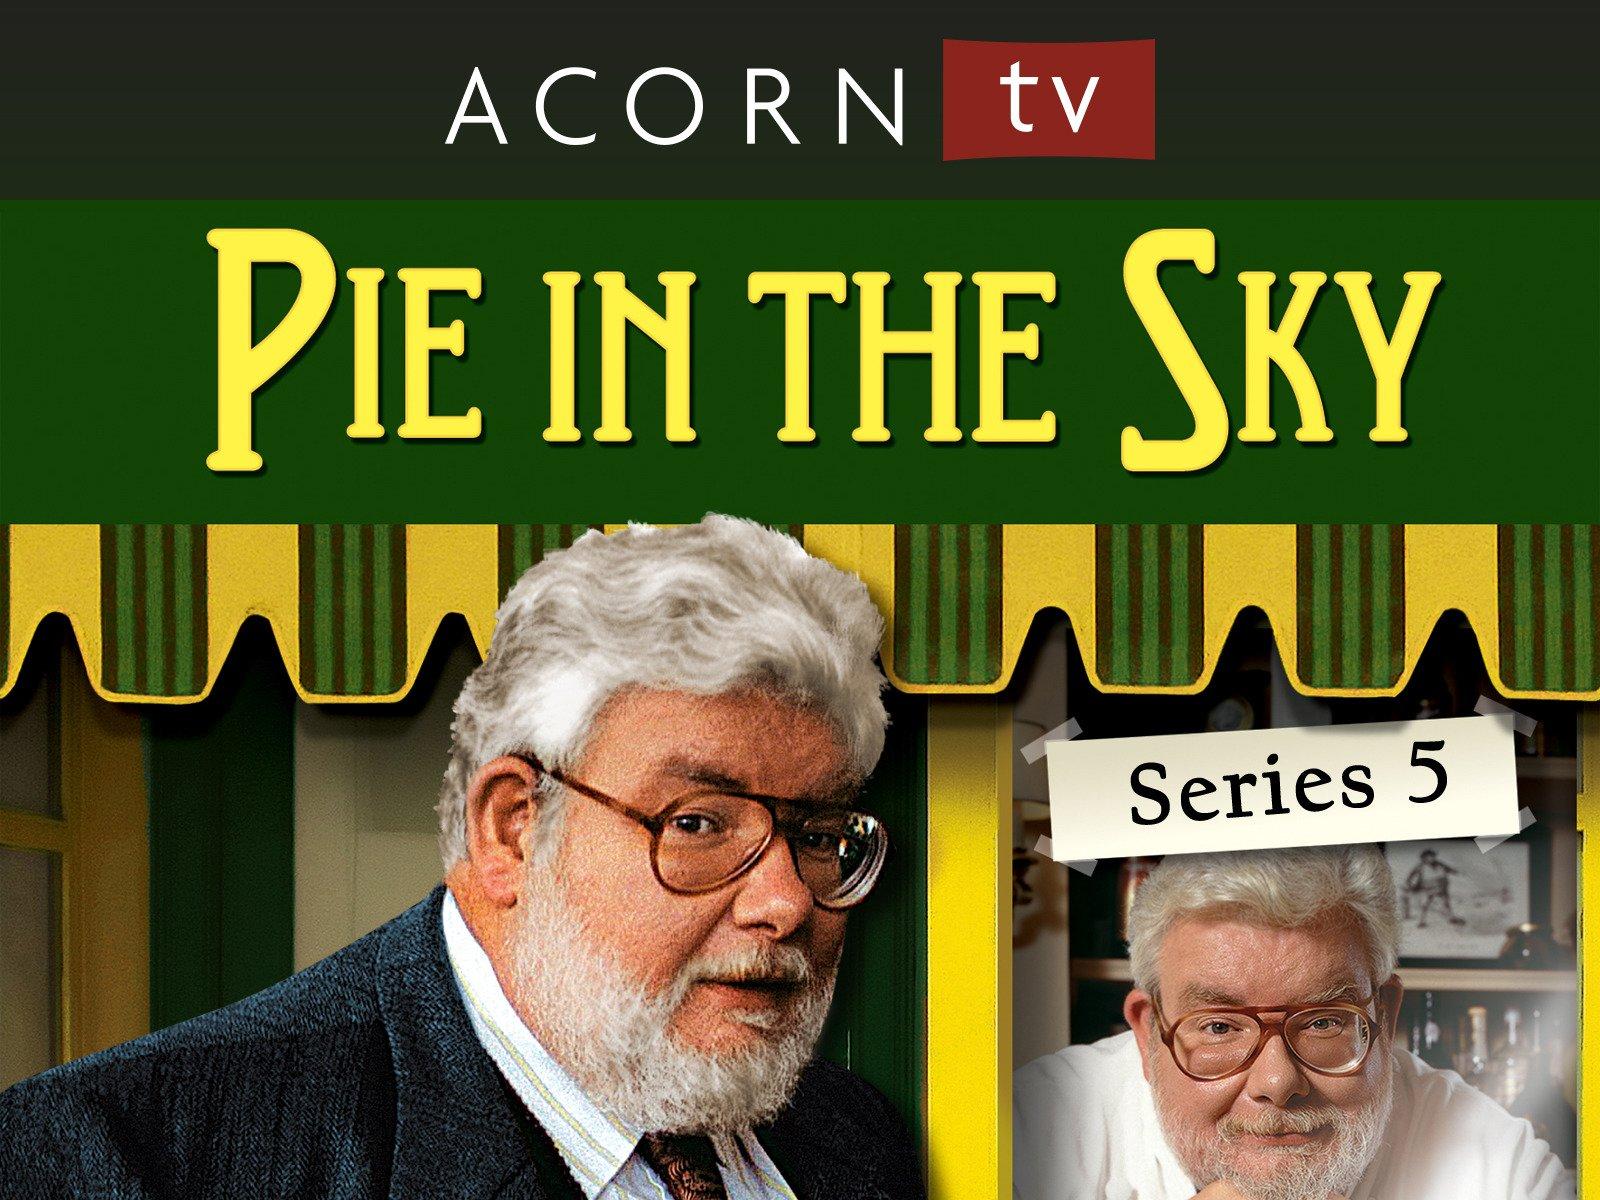 Pie in the Sky - Series 5